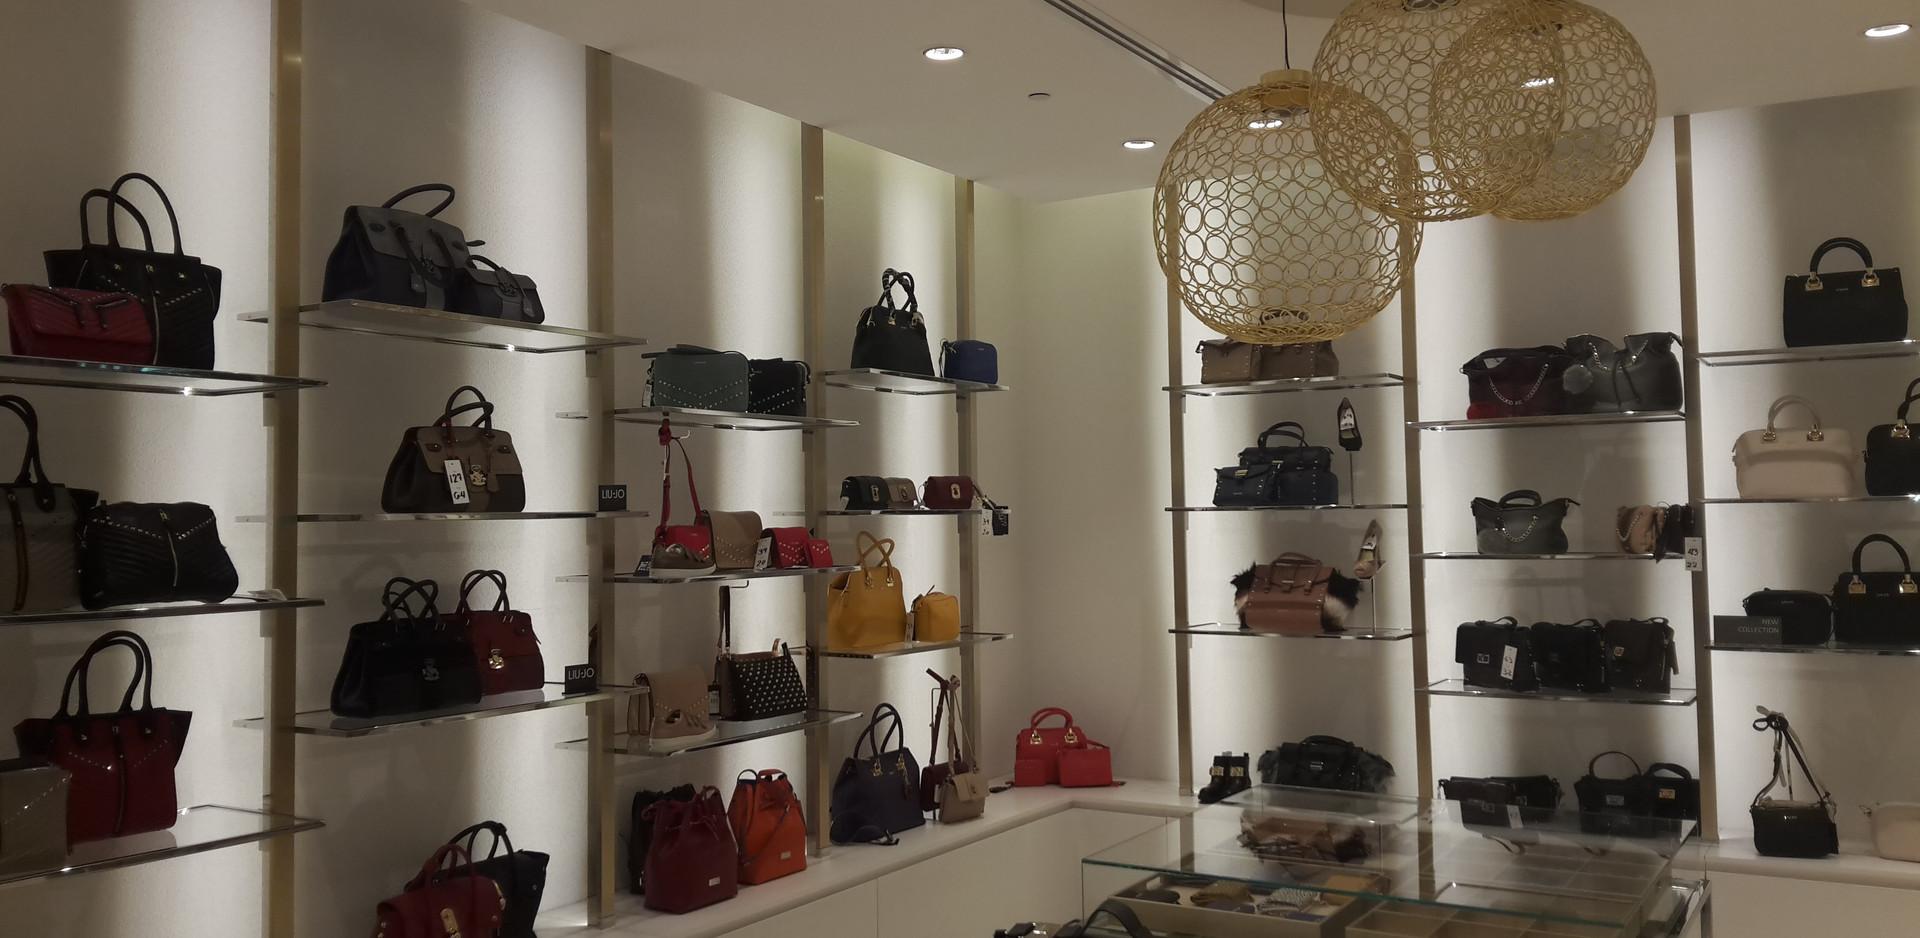 Negozio - The Gate Mall Kuwait